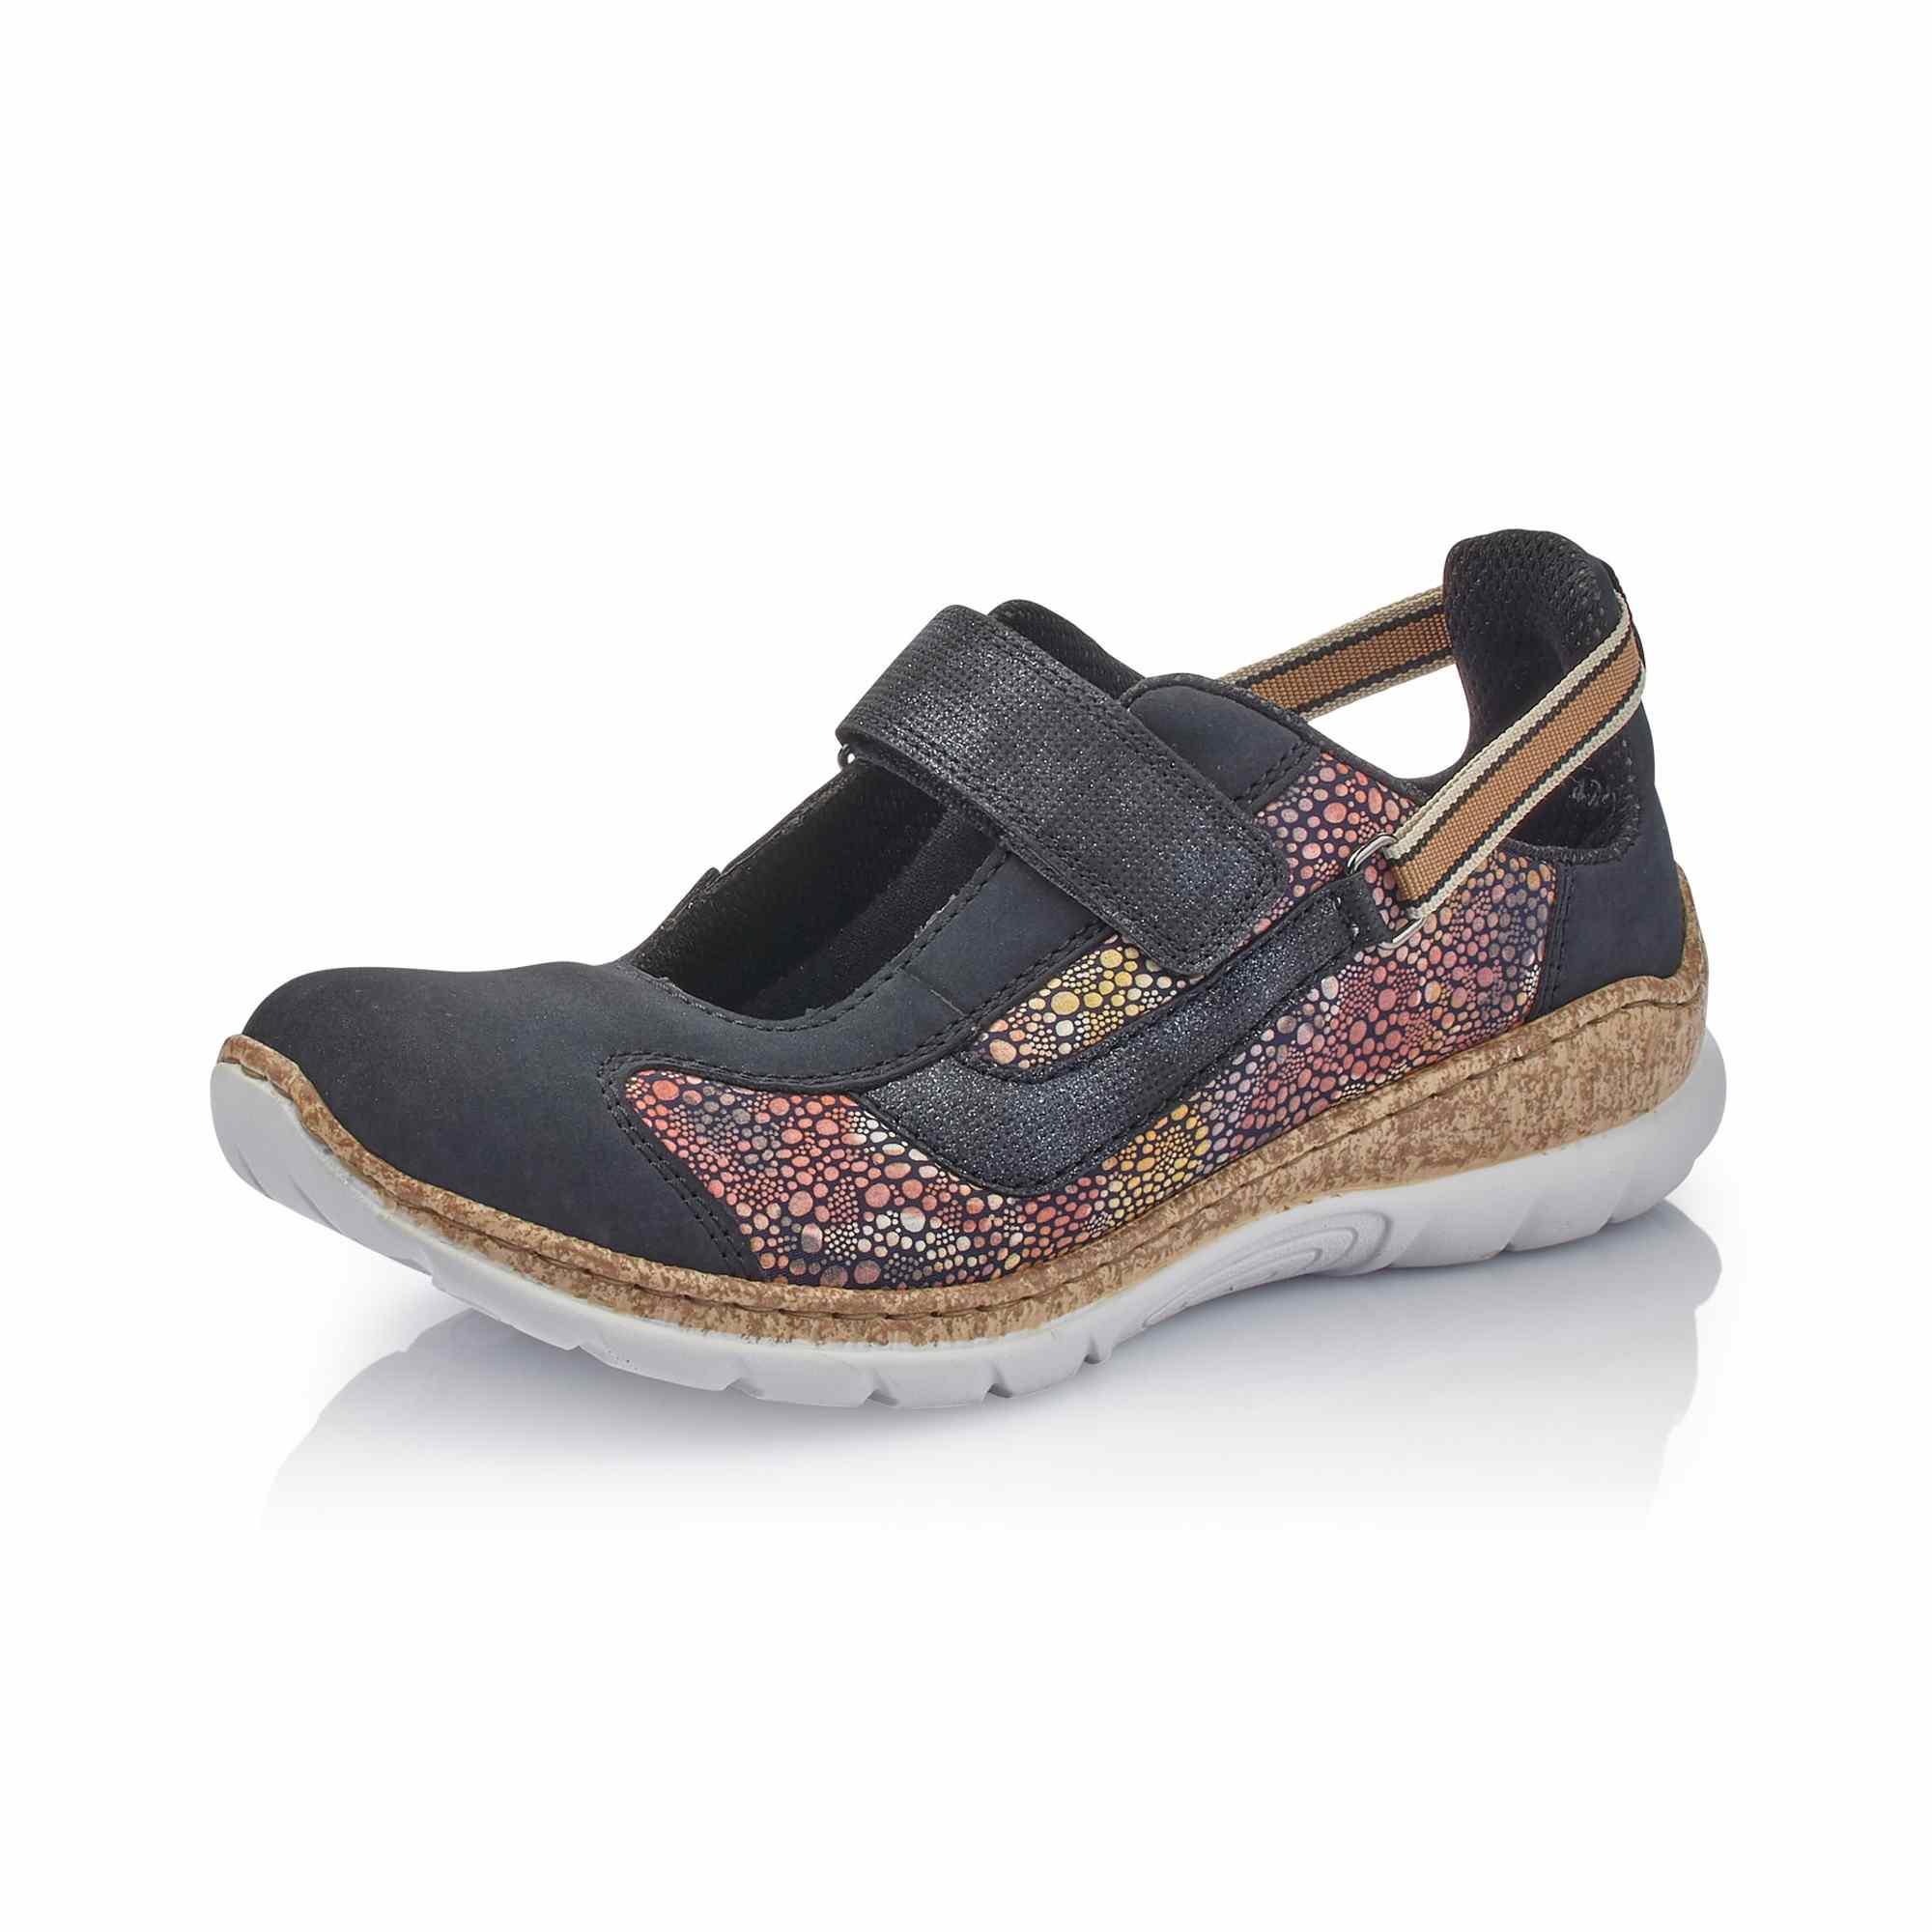 Dámská obuv RIEKERN42R8-14 BLAU KOMBI F S 9  5c48e884fe